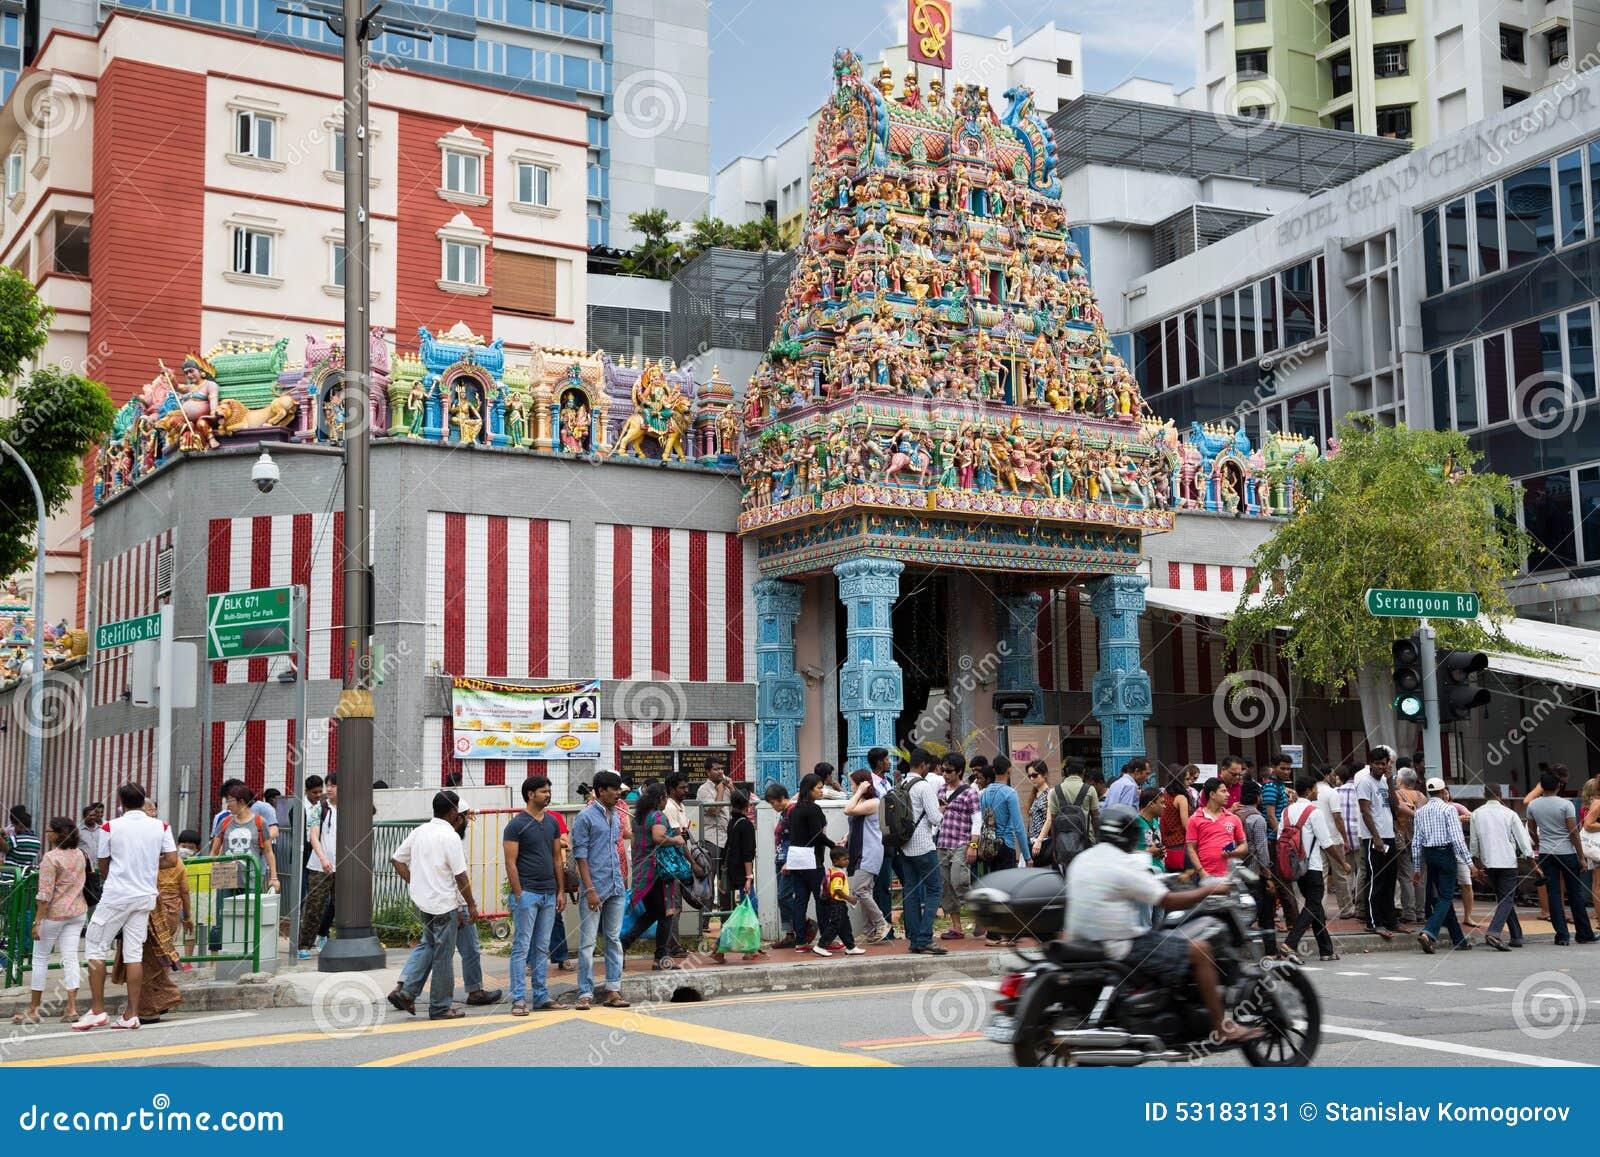 sri veerama kaliamman temple in little india singapore. Black Bedroom Furniture Sets. Home Design Ideas